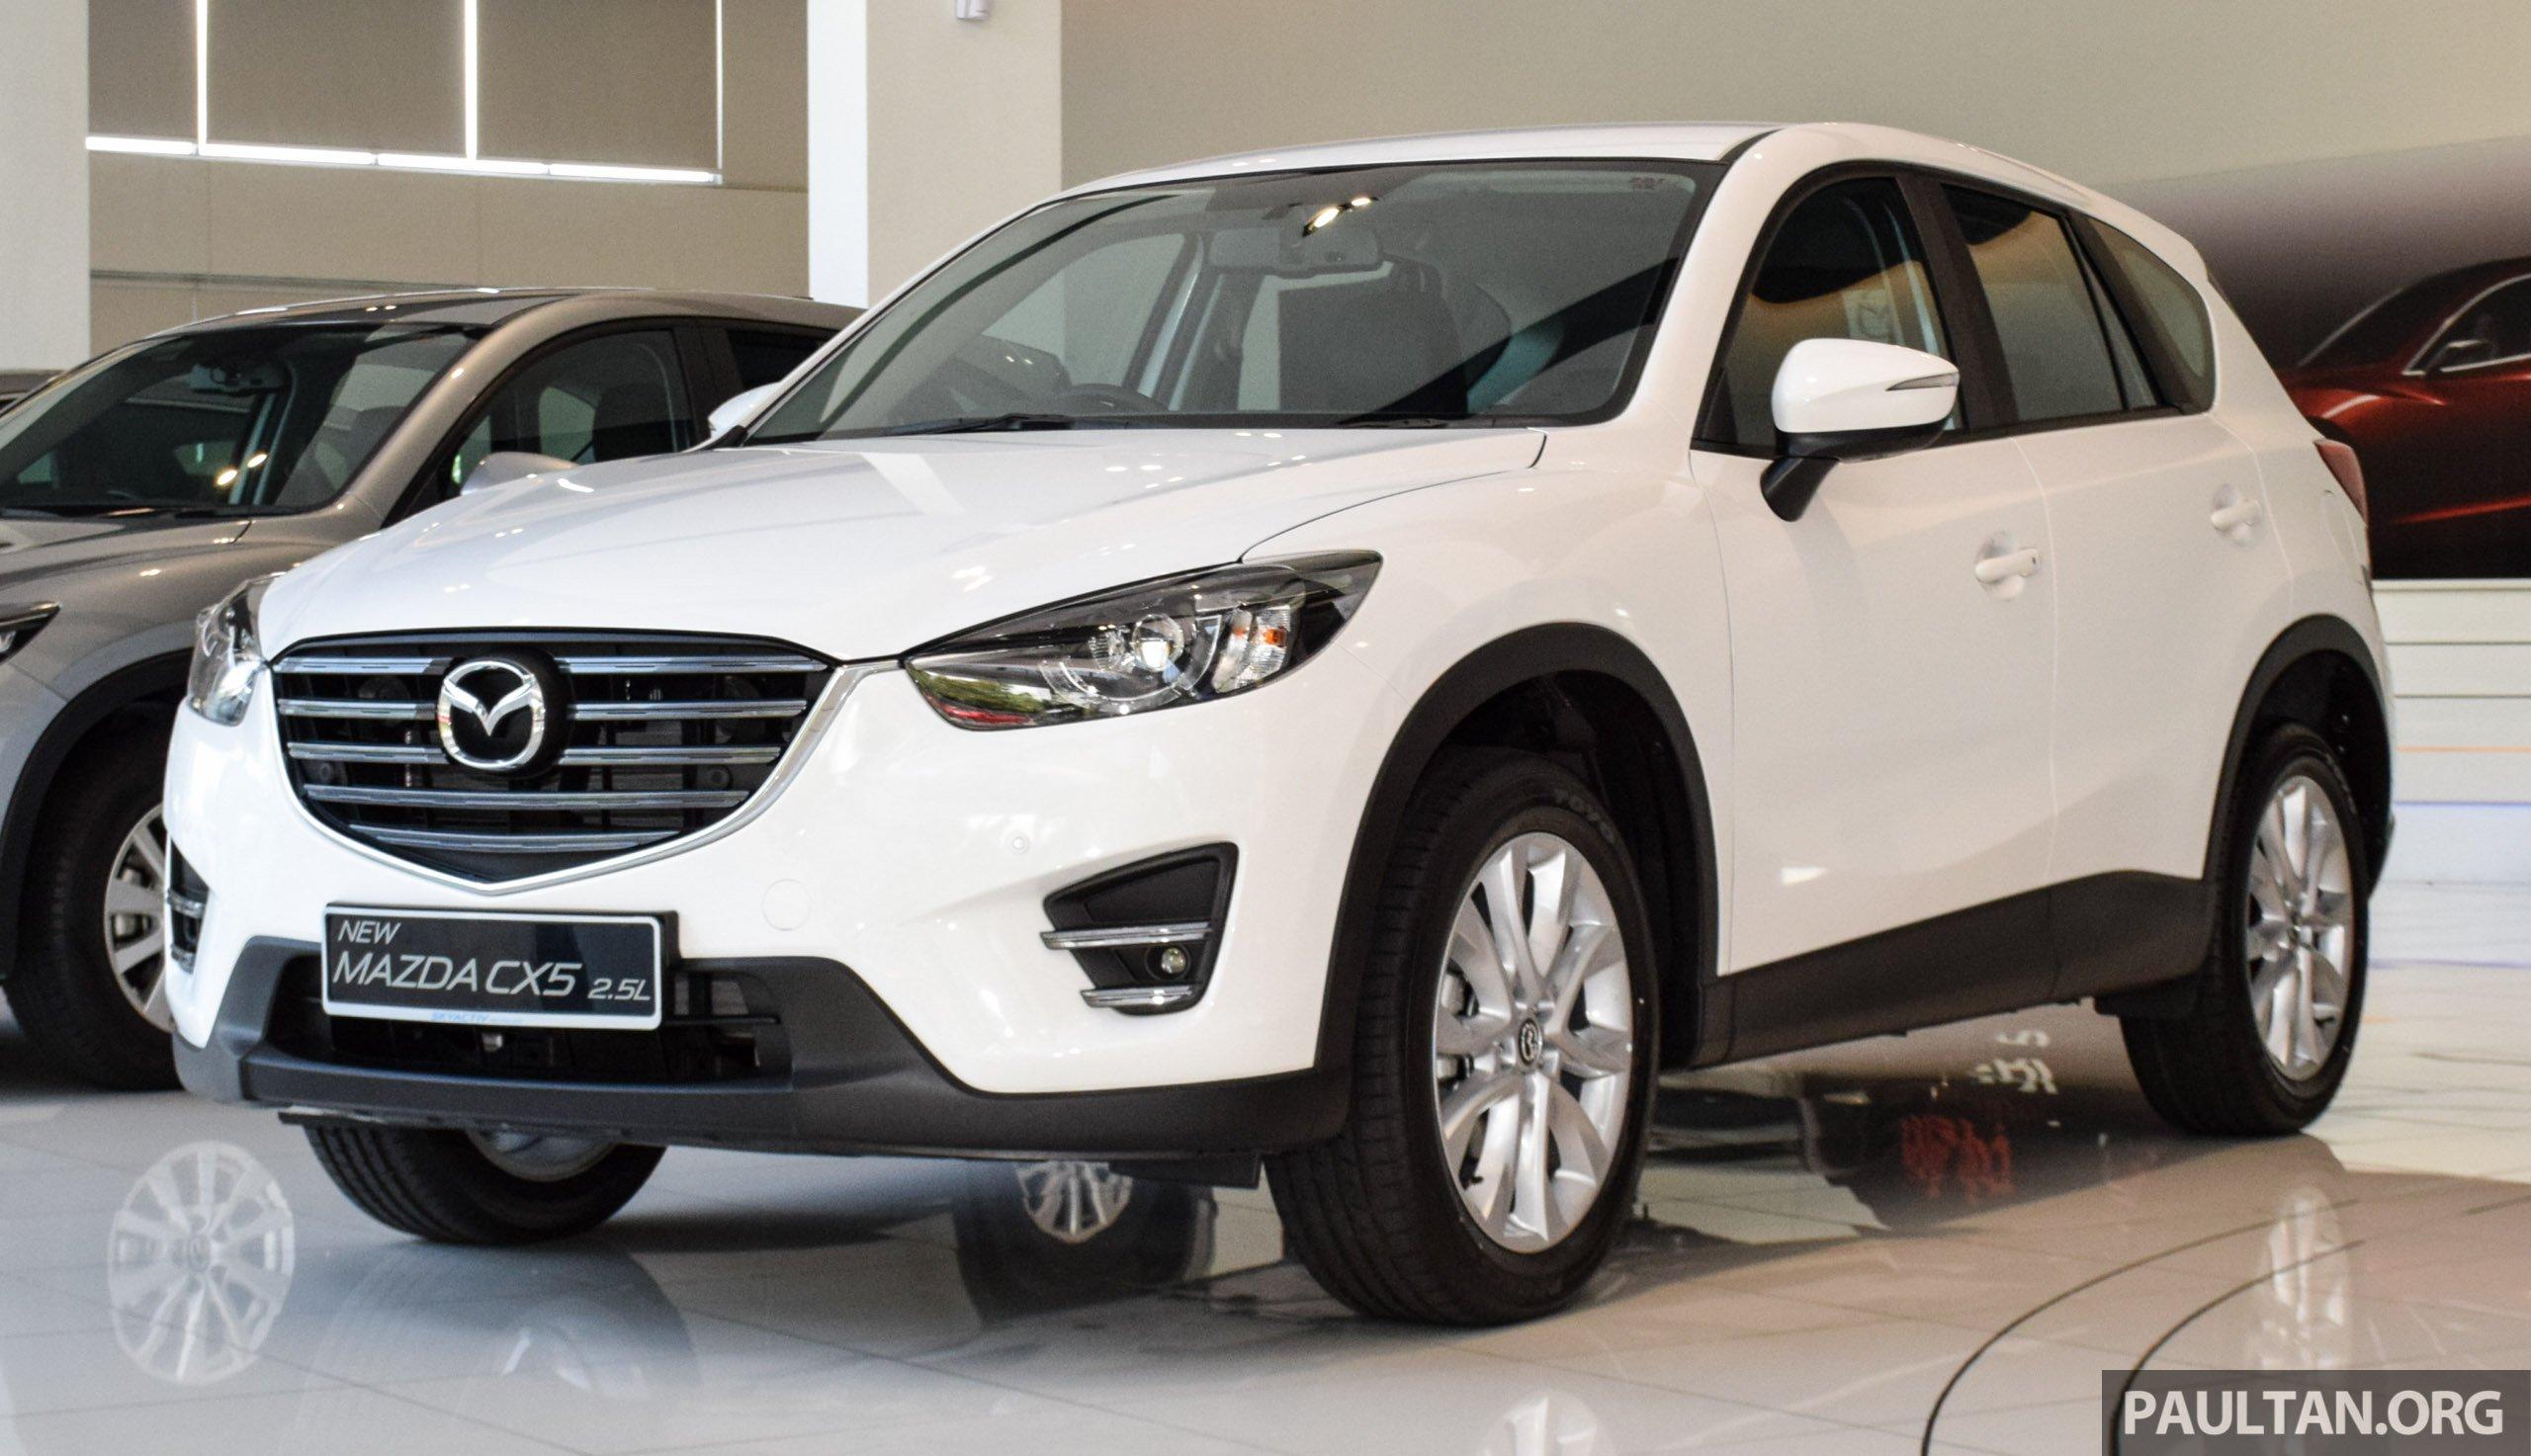 Kelebihan Mazda Cx 5 2.5 Spesifikasi